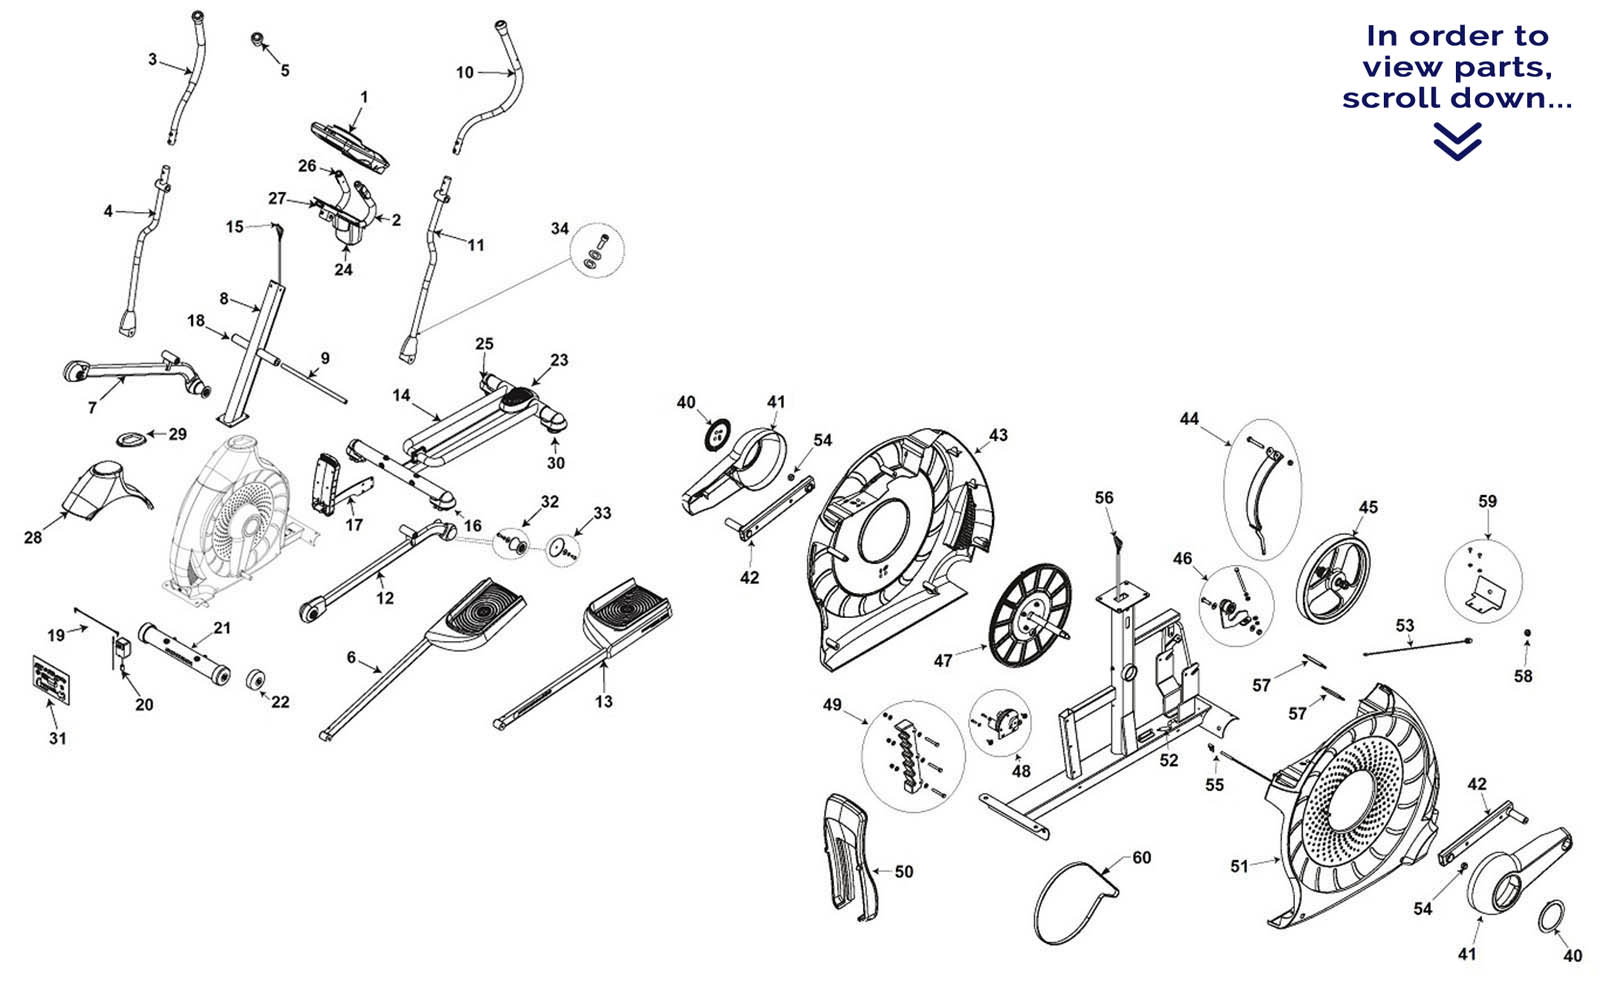 cybex diagrams